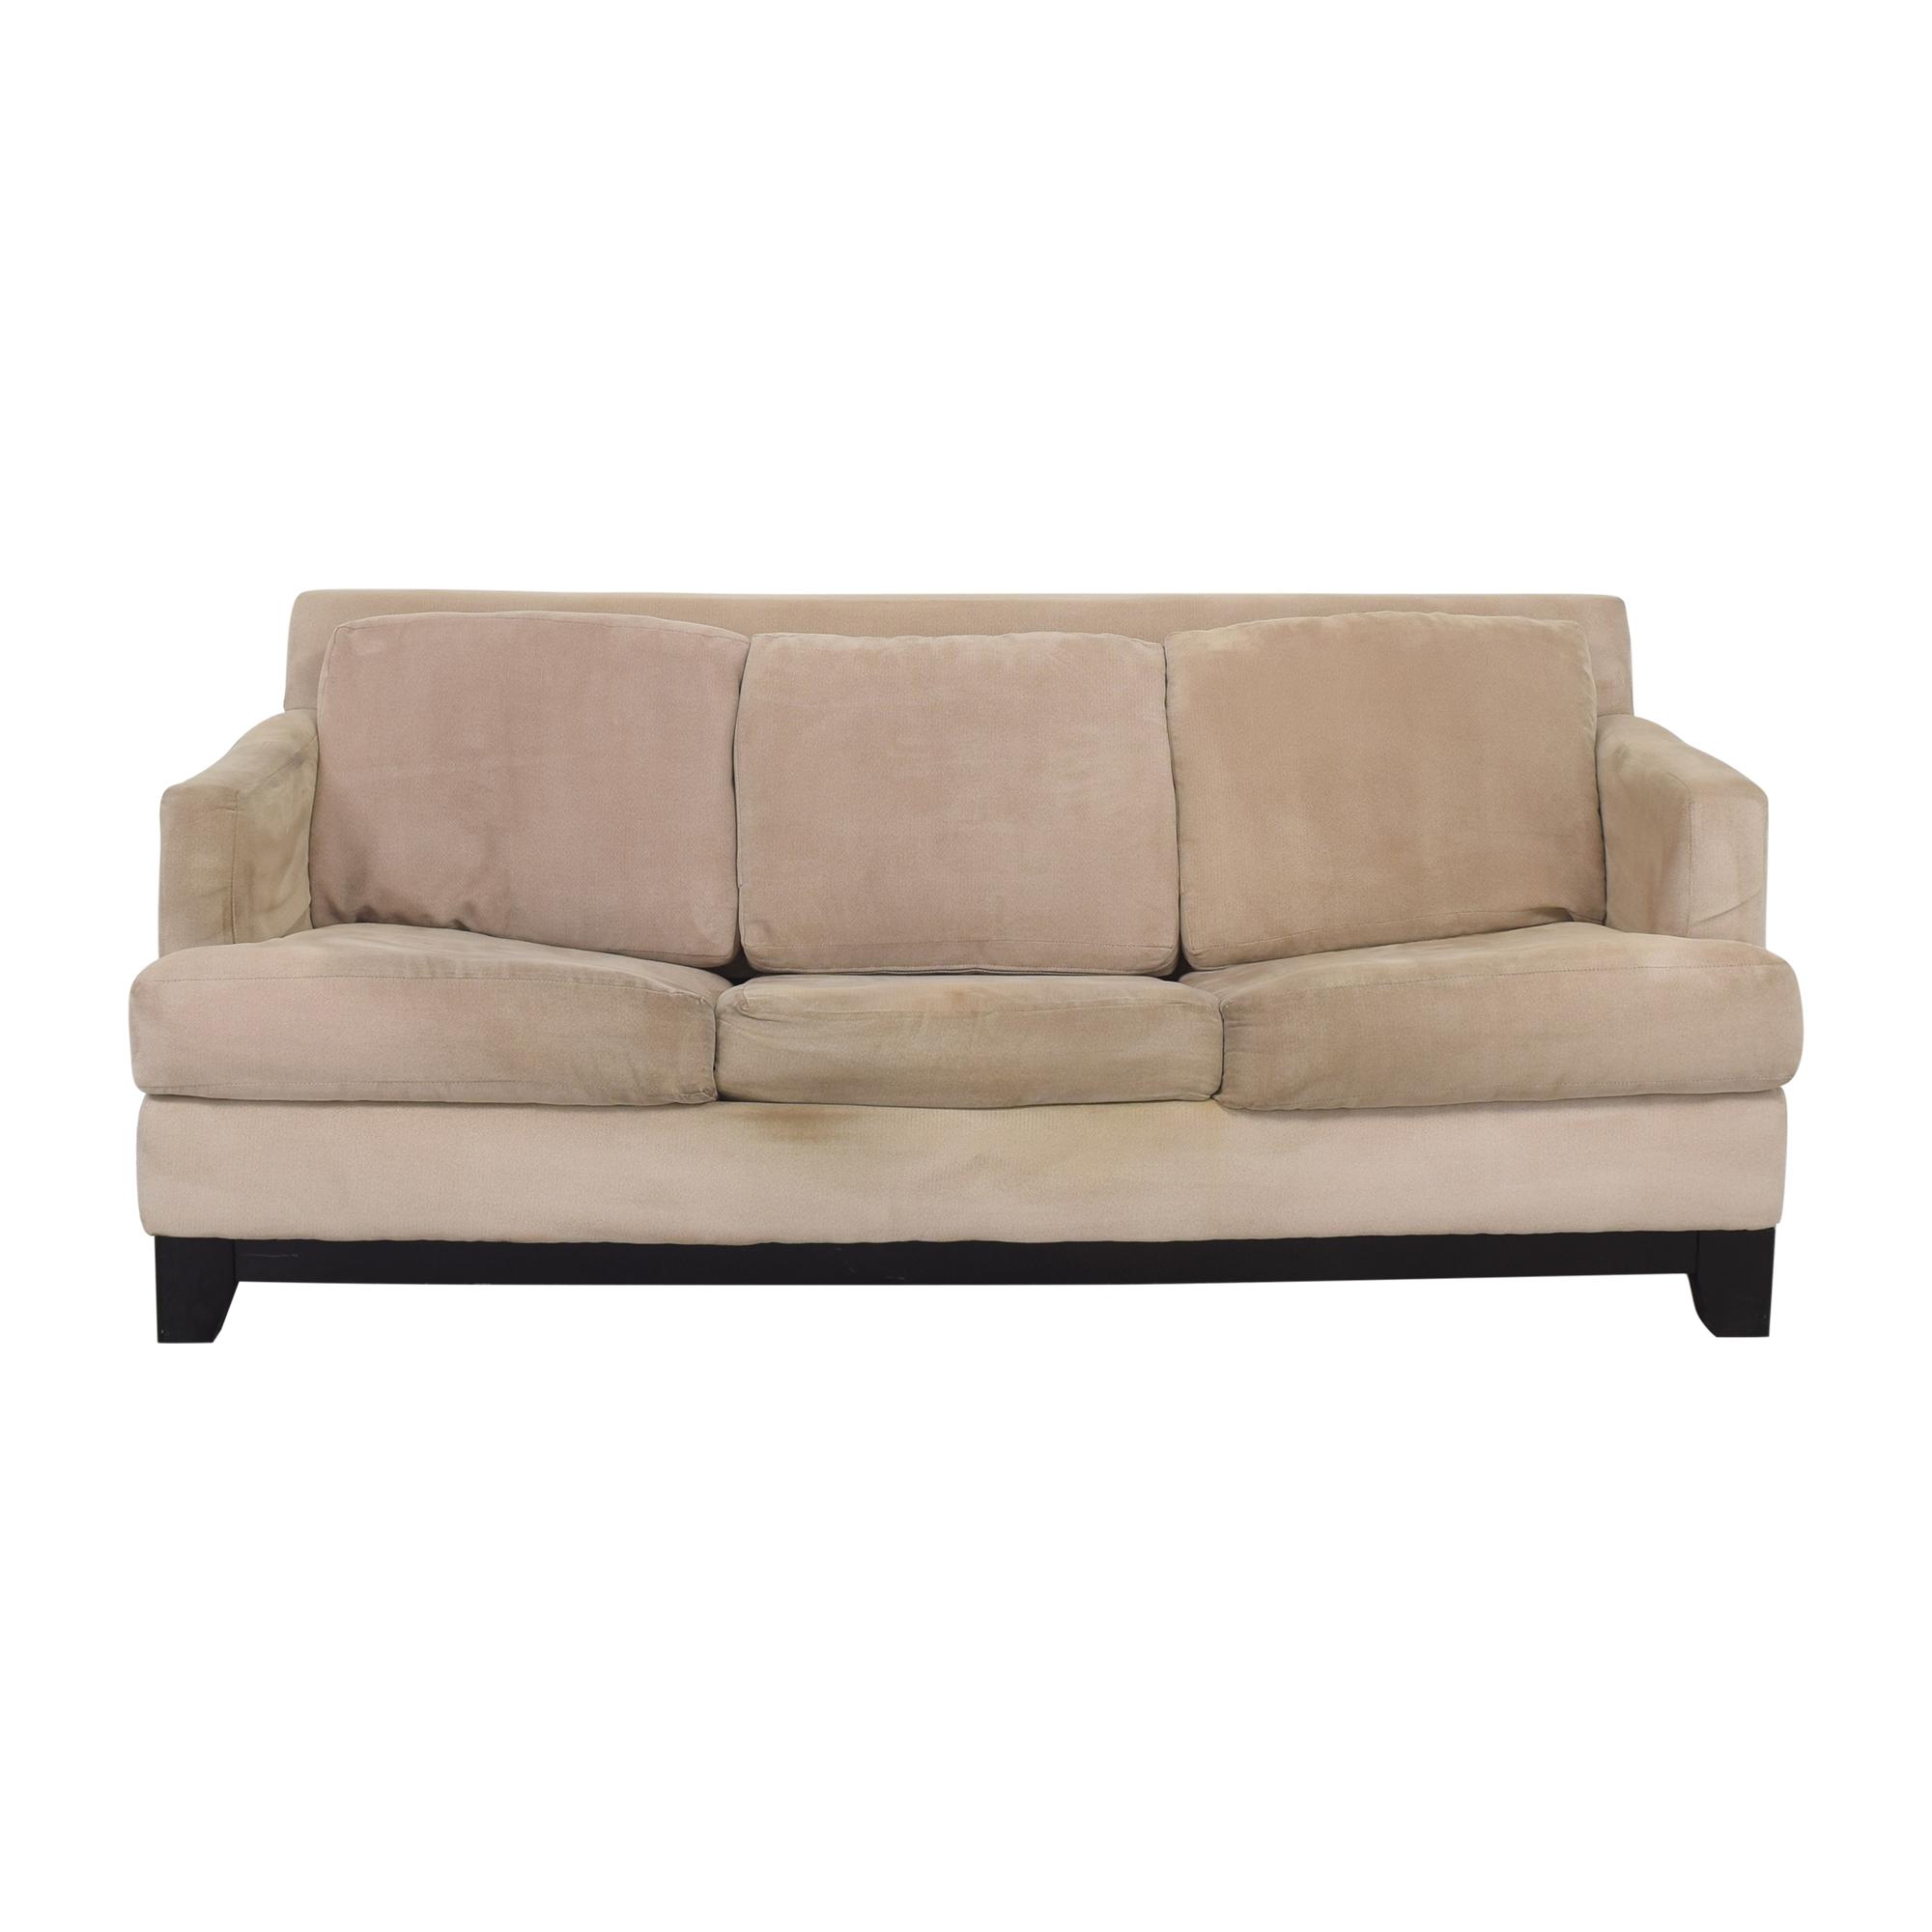 Macy's Macy's Sleeper Sofa nyc